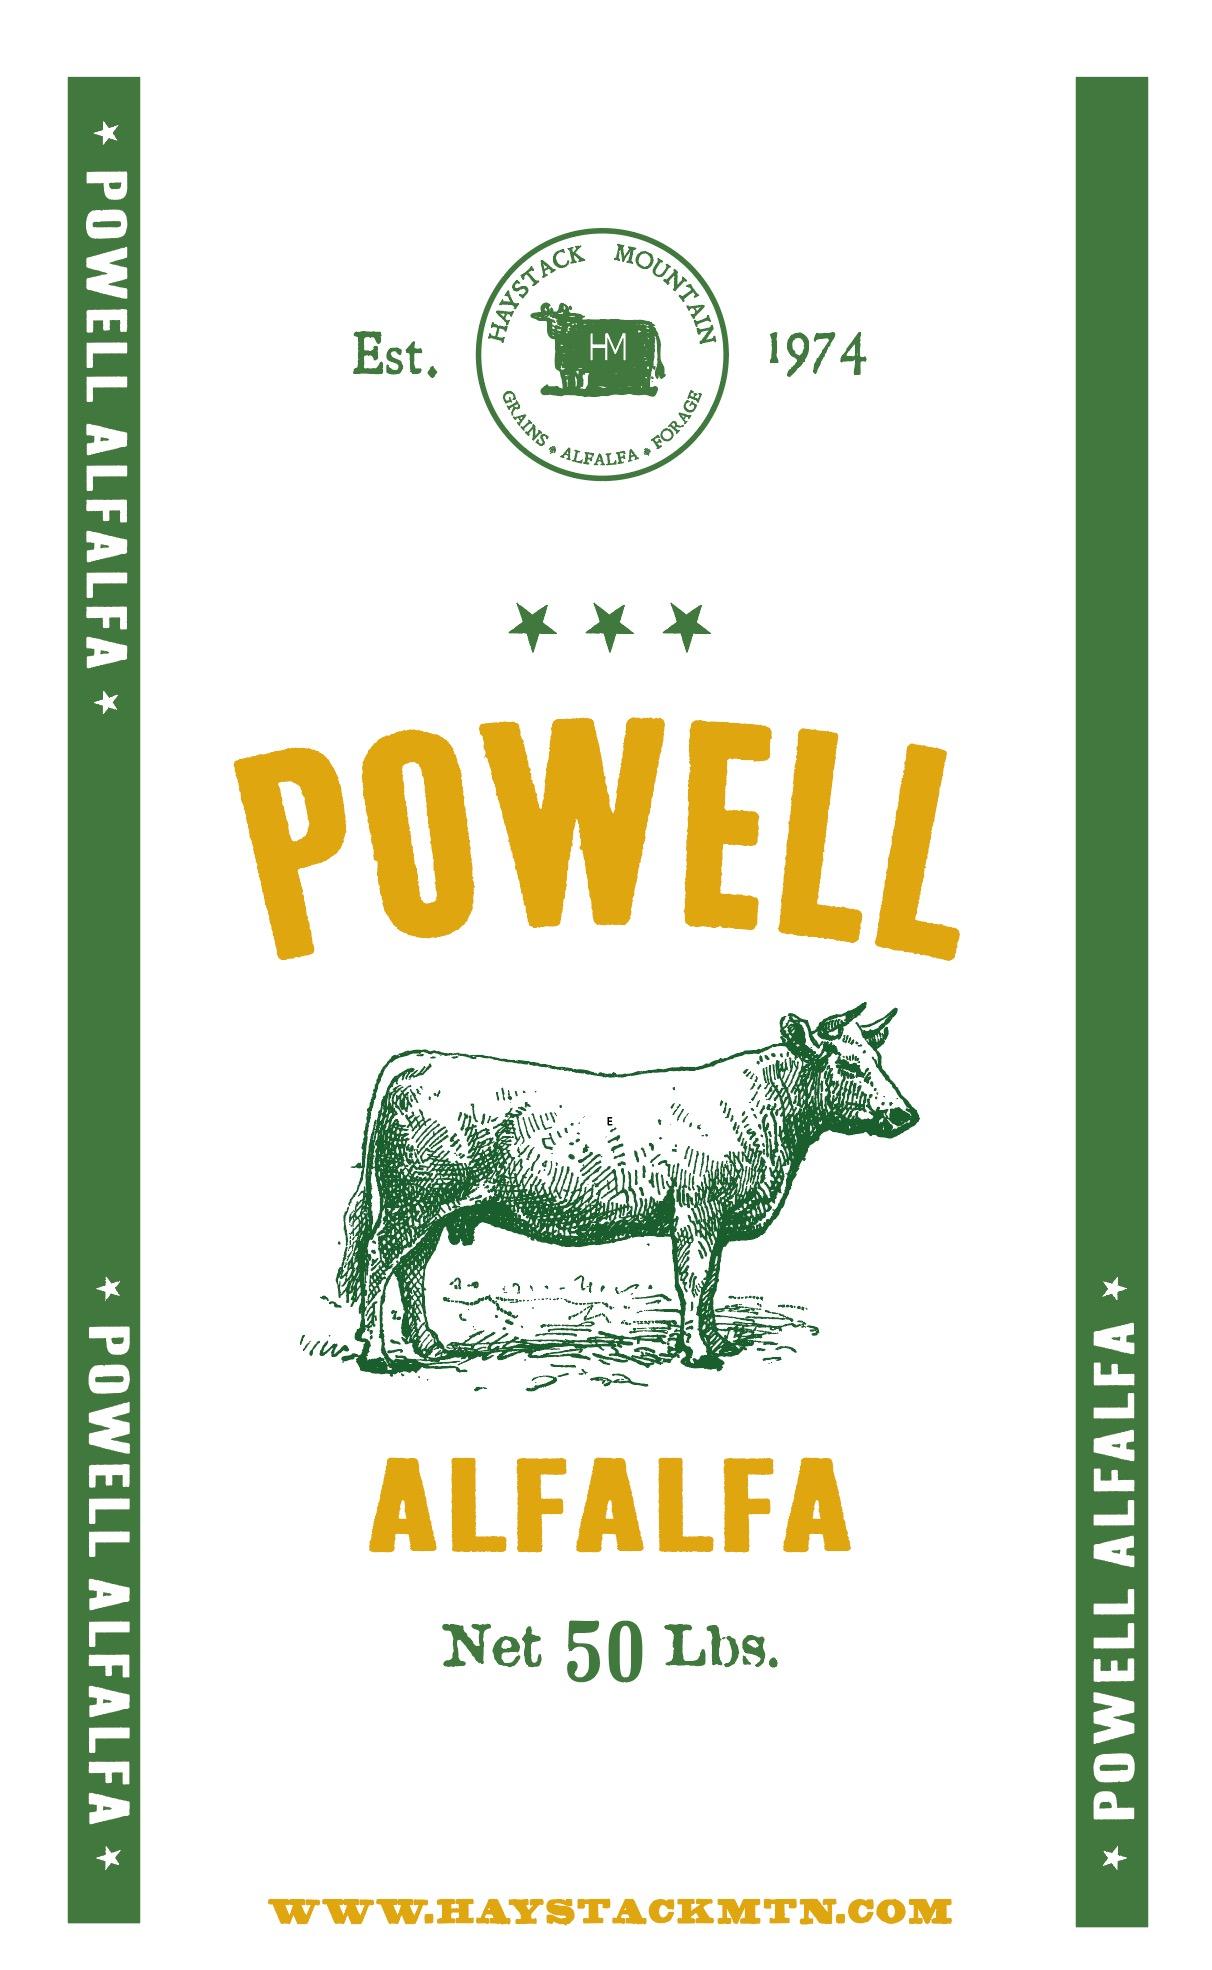 powell alfalfa